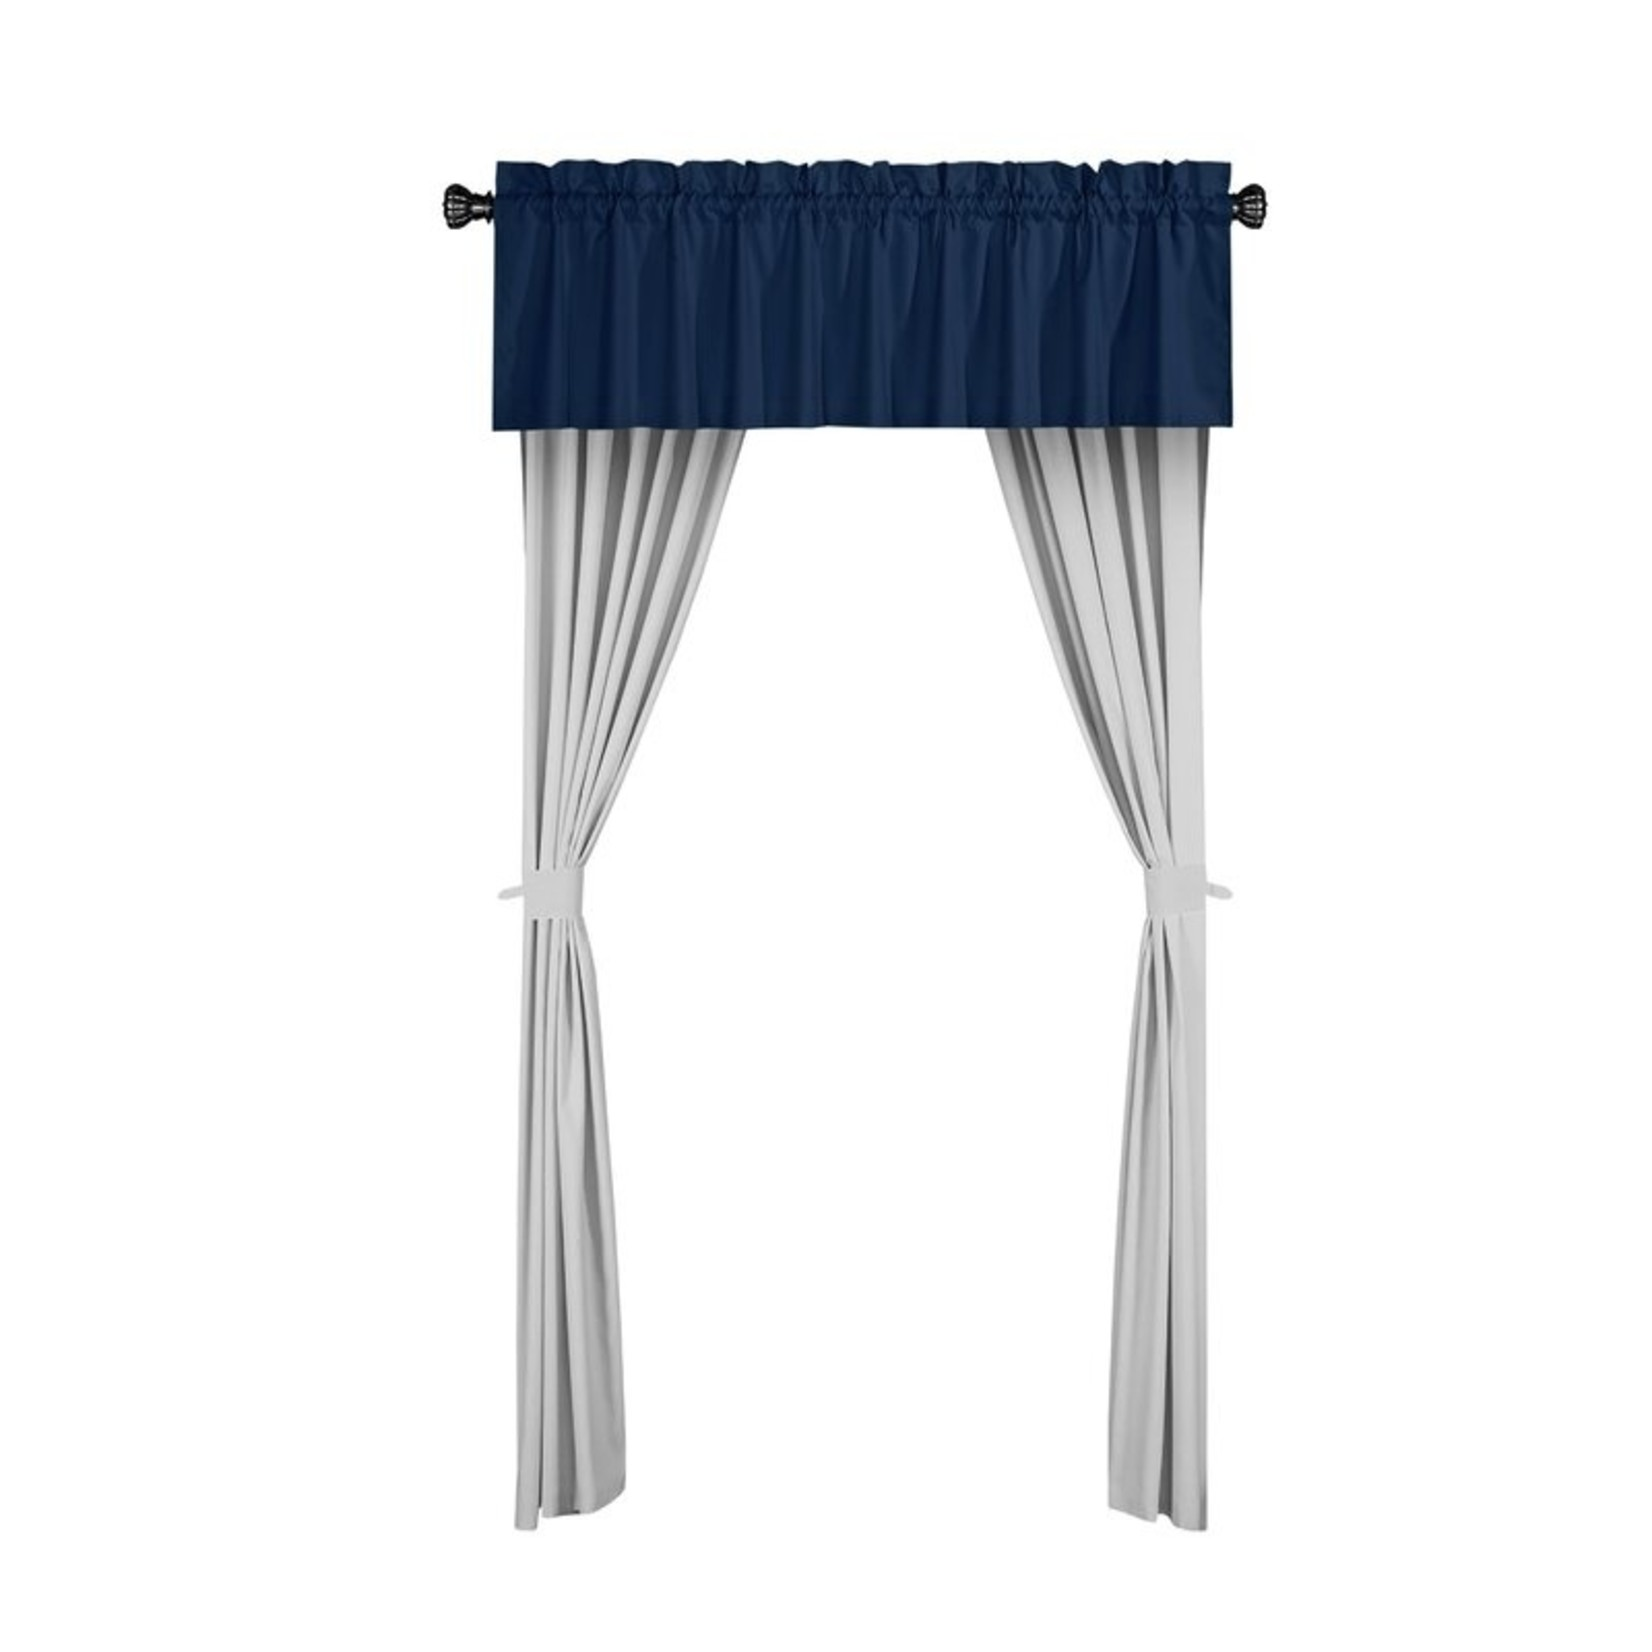 *King - Galloway 20 Piece Comforter Set - Final Sale